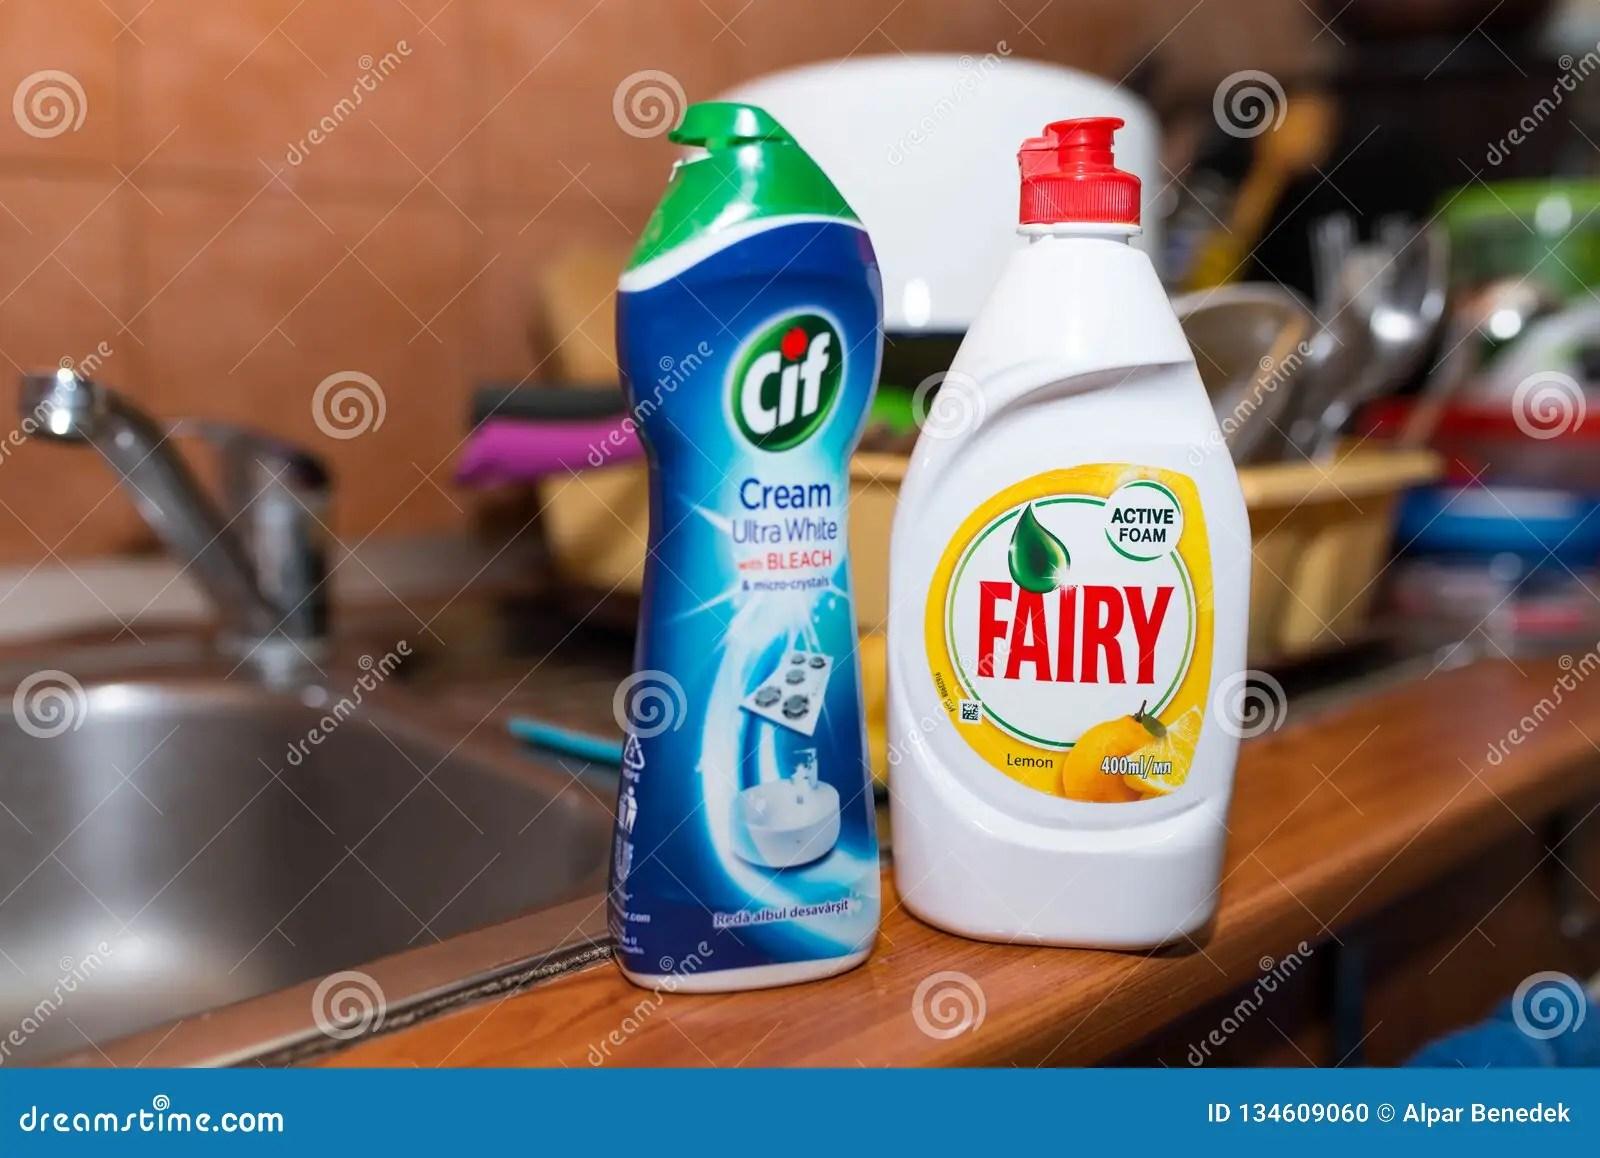 https www dreamstime com miercurea ciuc romania december fairy cif cleaning supplies kitchen sink image134609060